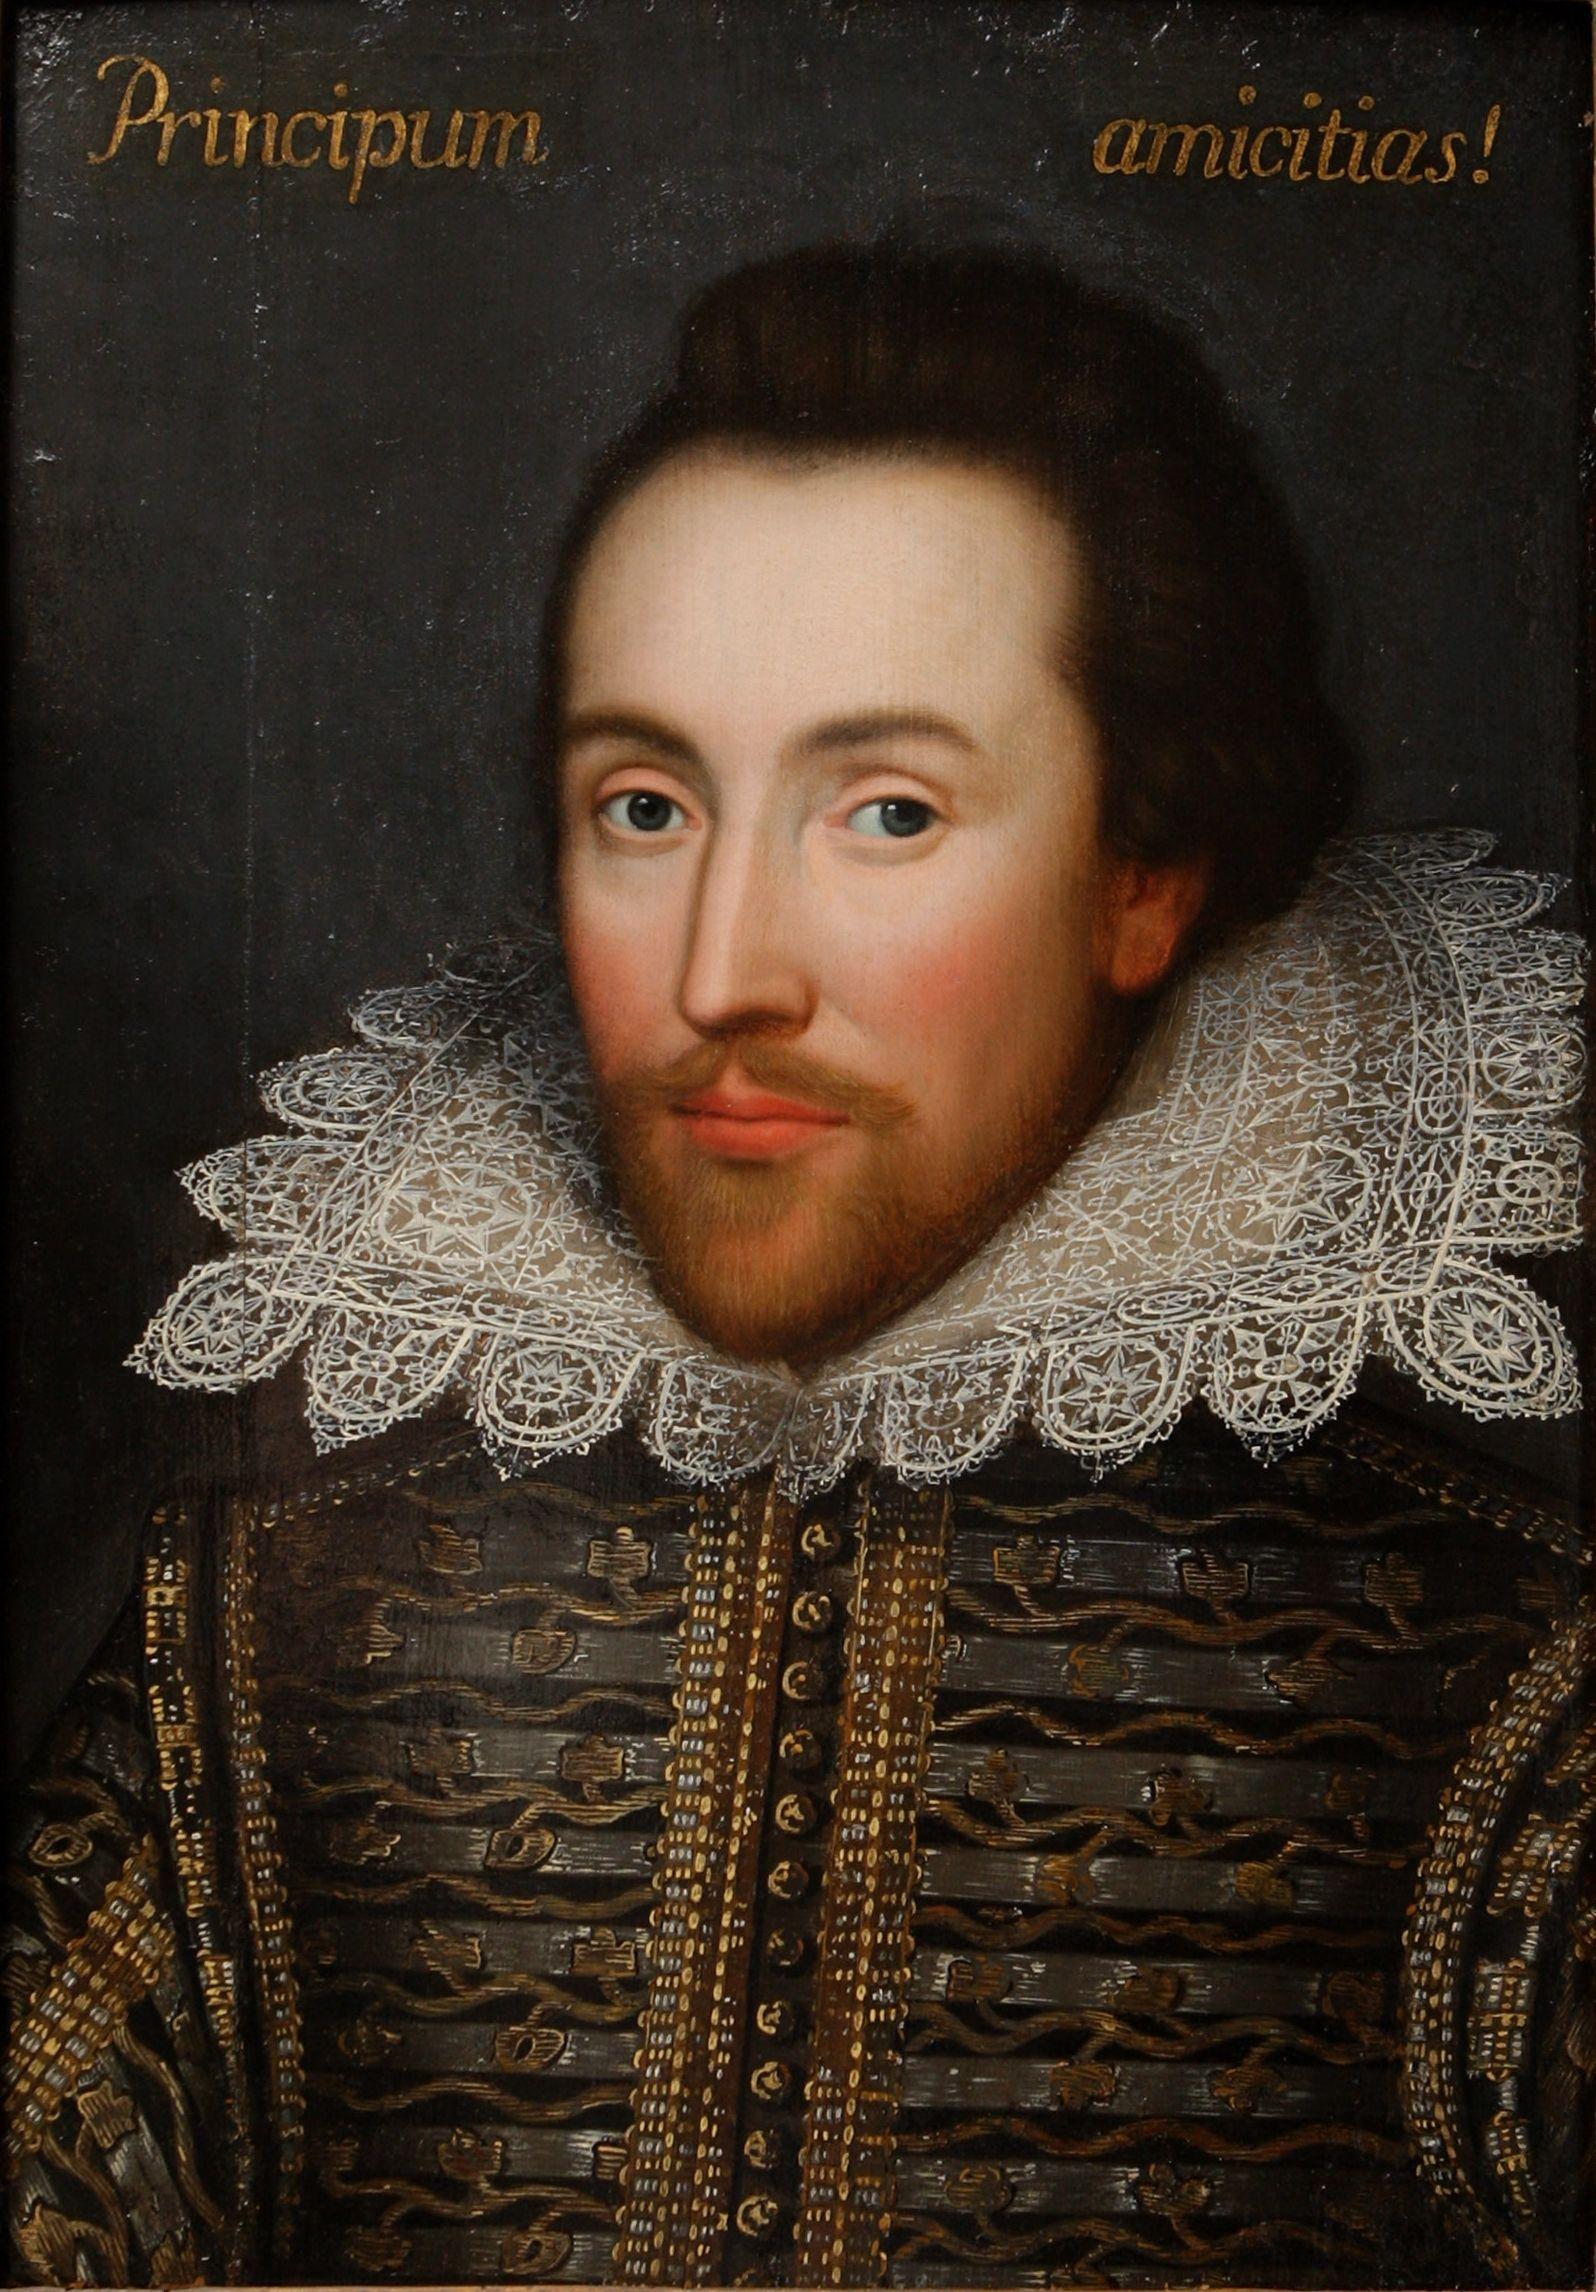 William Shakespeare - Cobbe portrait